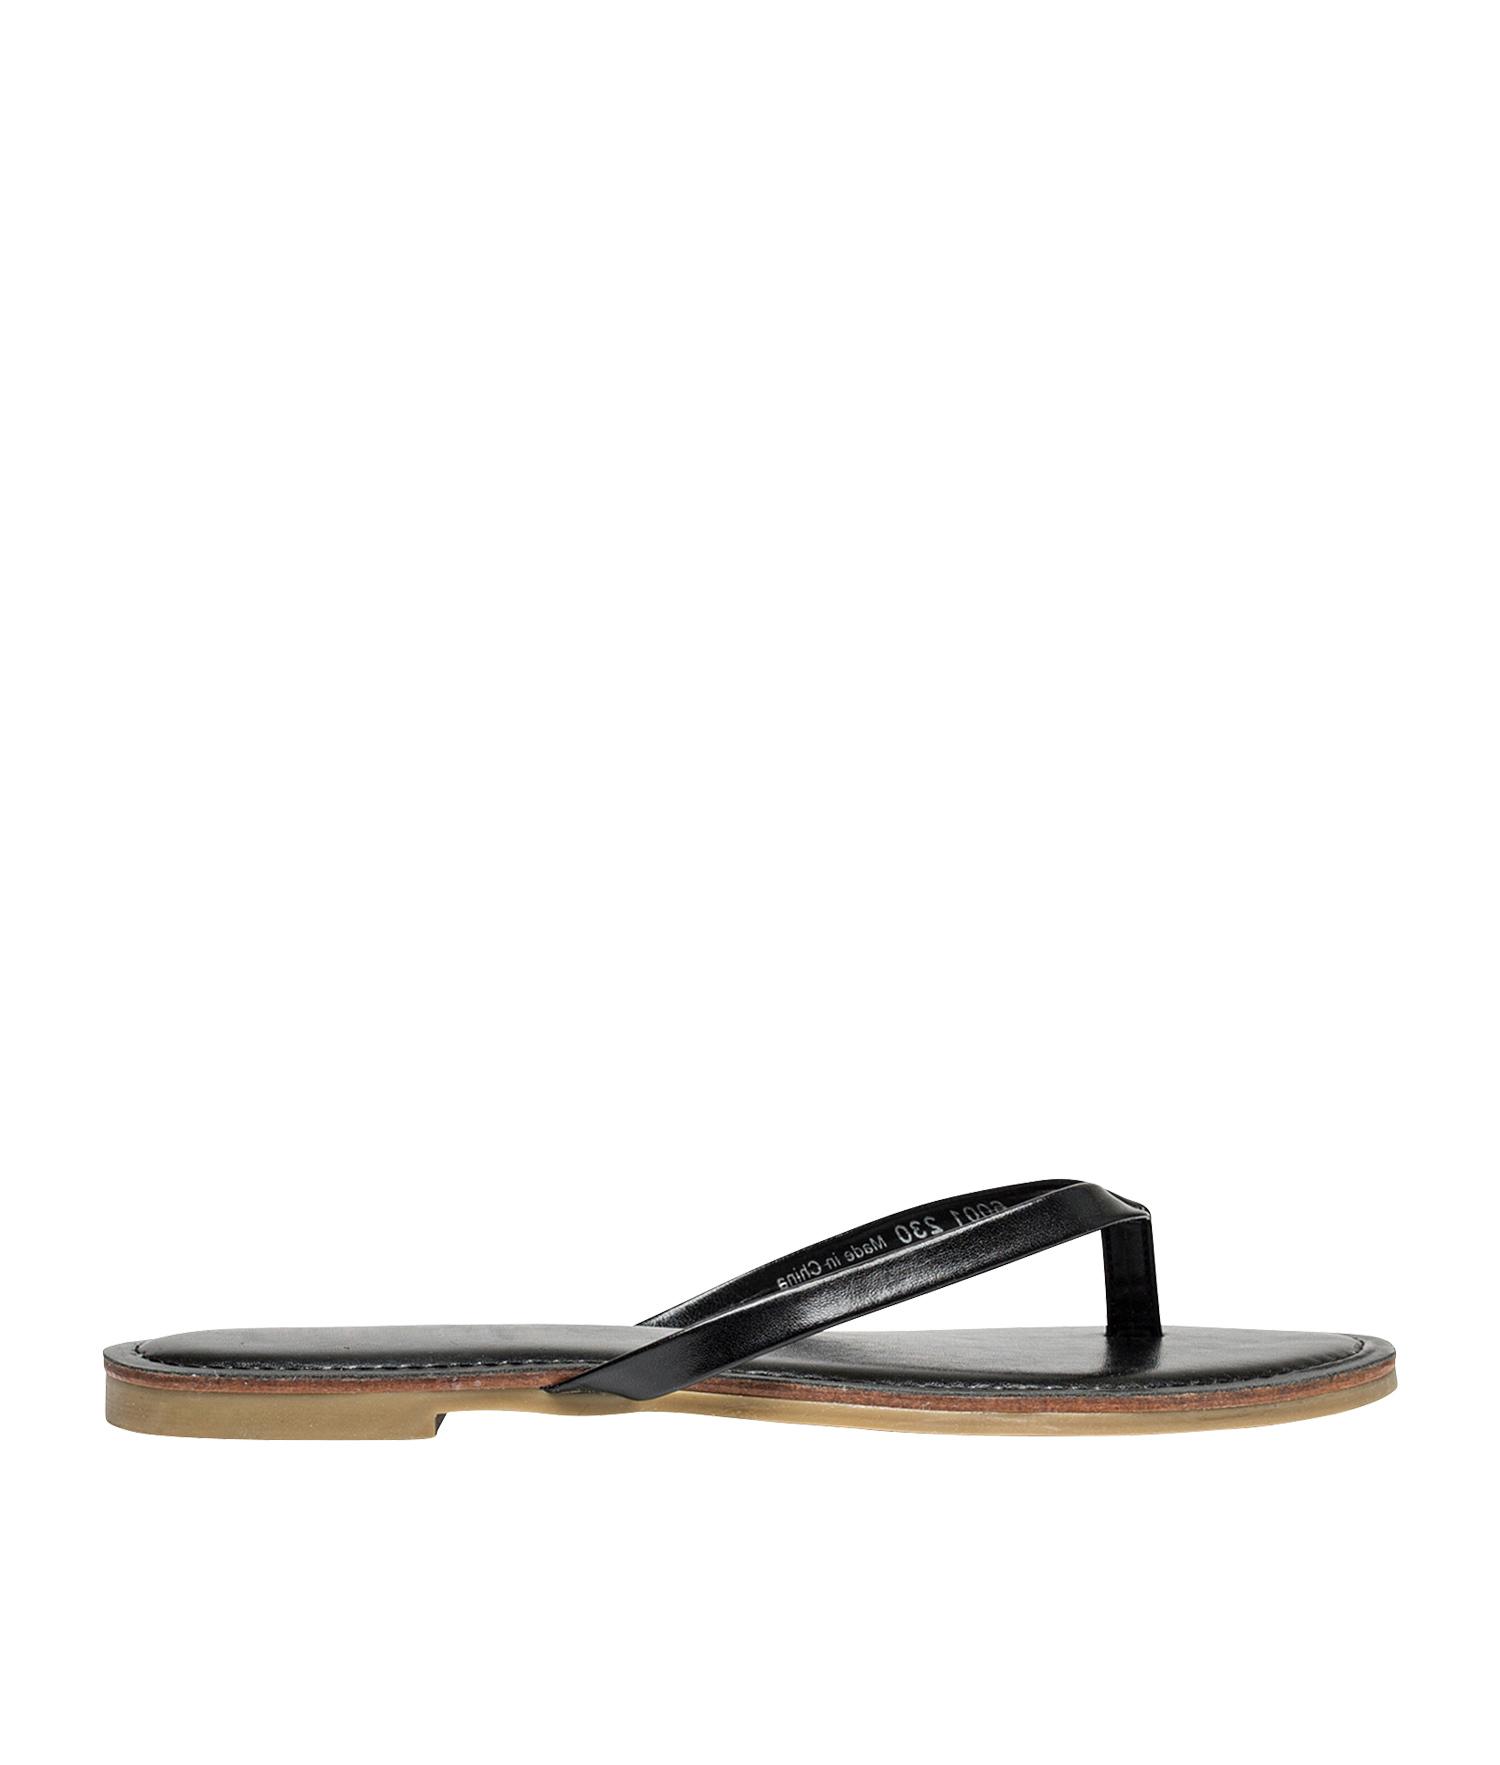 e2922a6291aaa AnnaKastle Womens Sunshine Classic Flip Flop Sandals Black